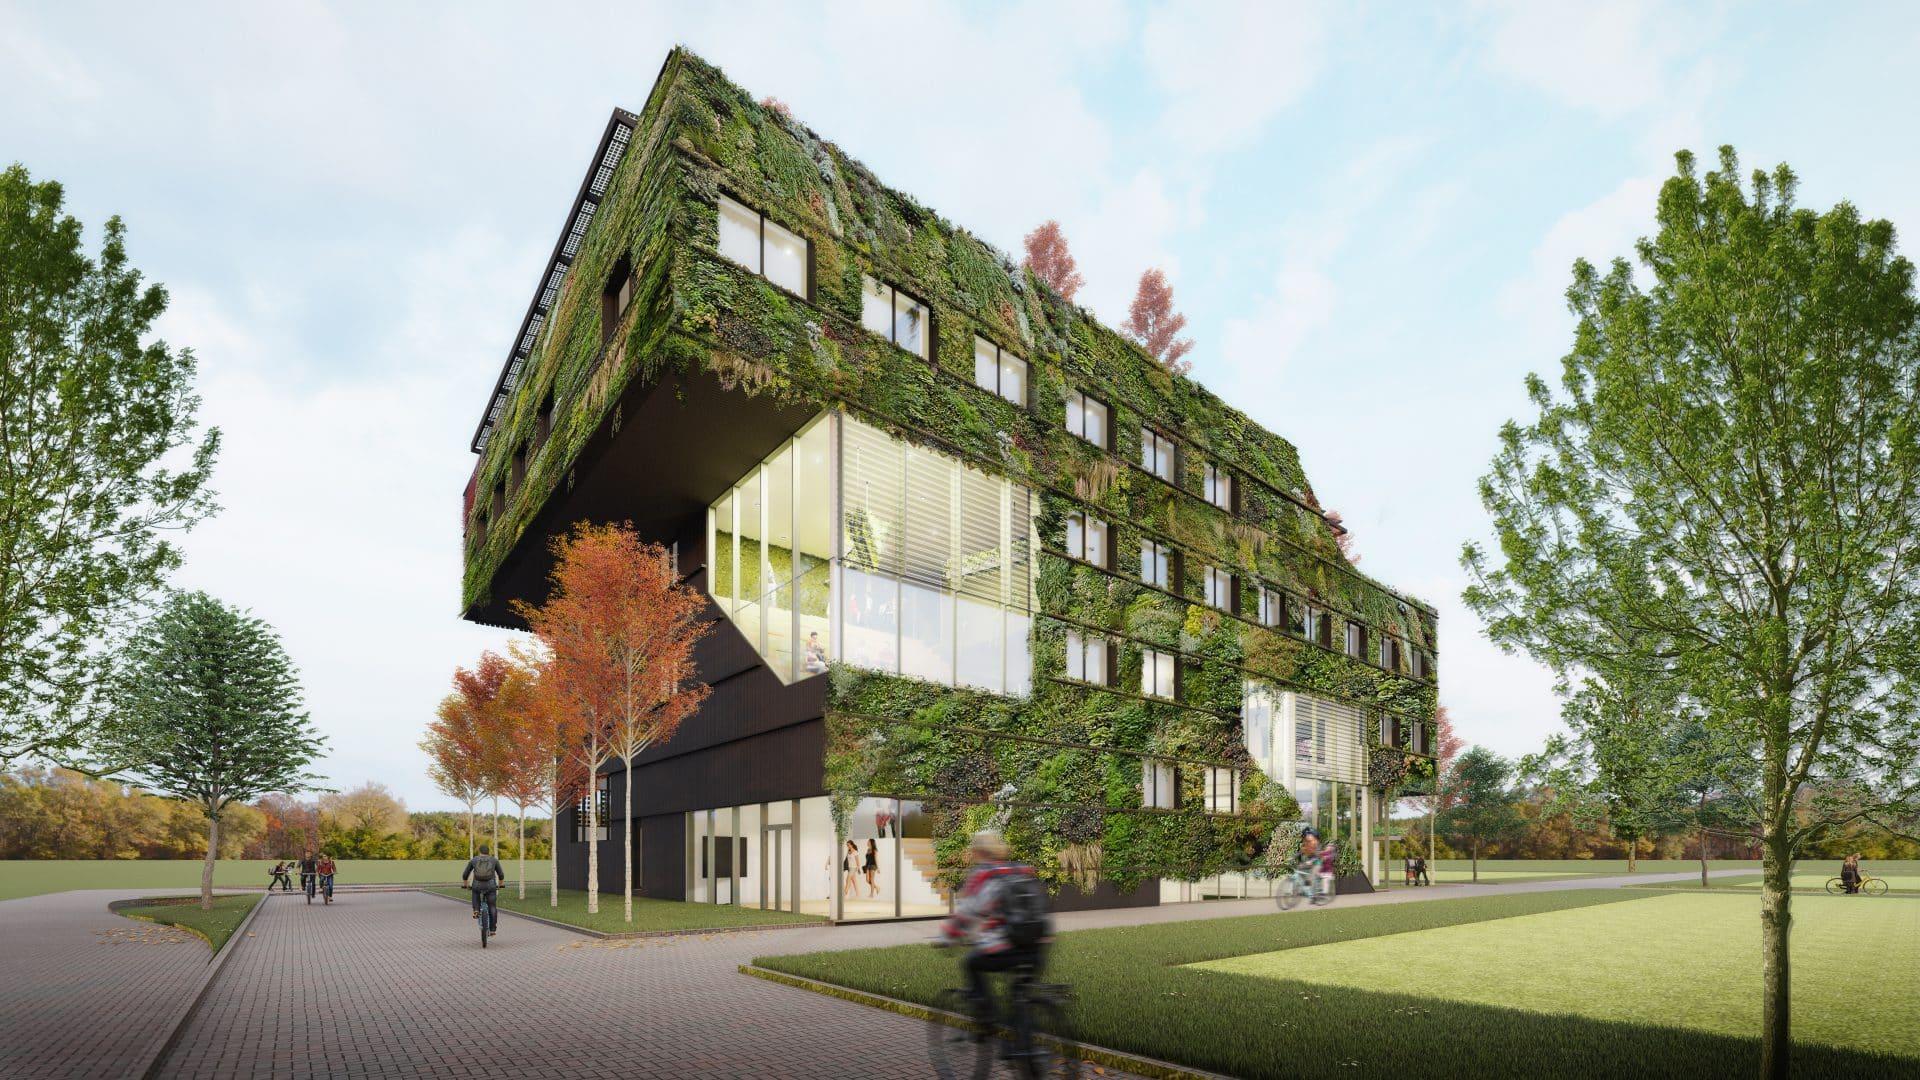 Floriade buildings 2022